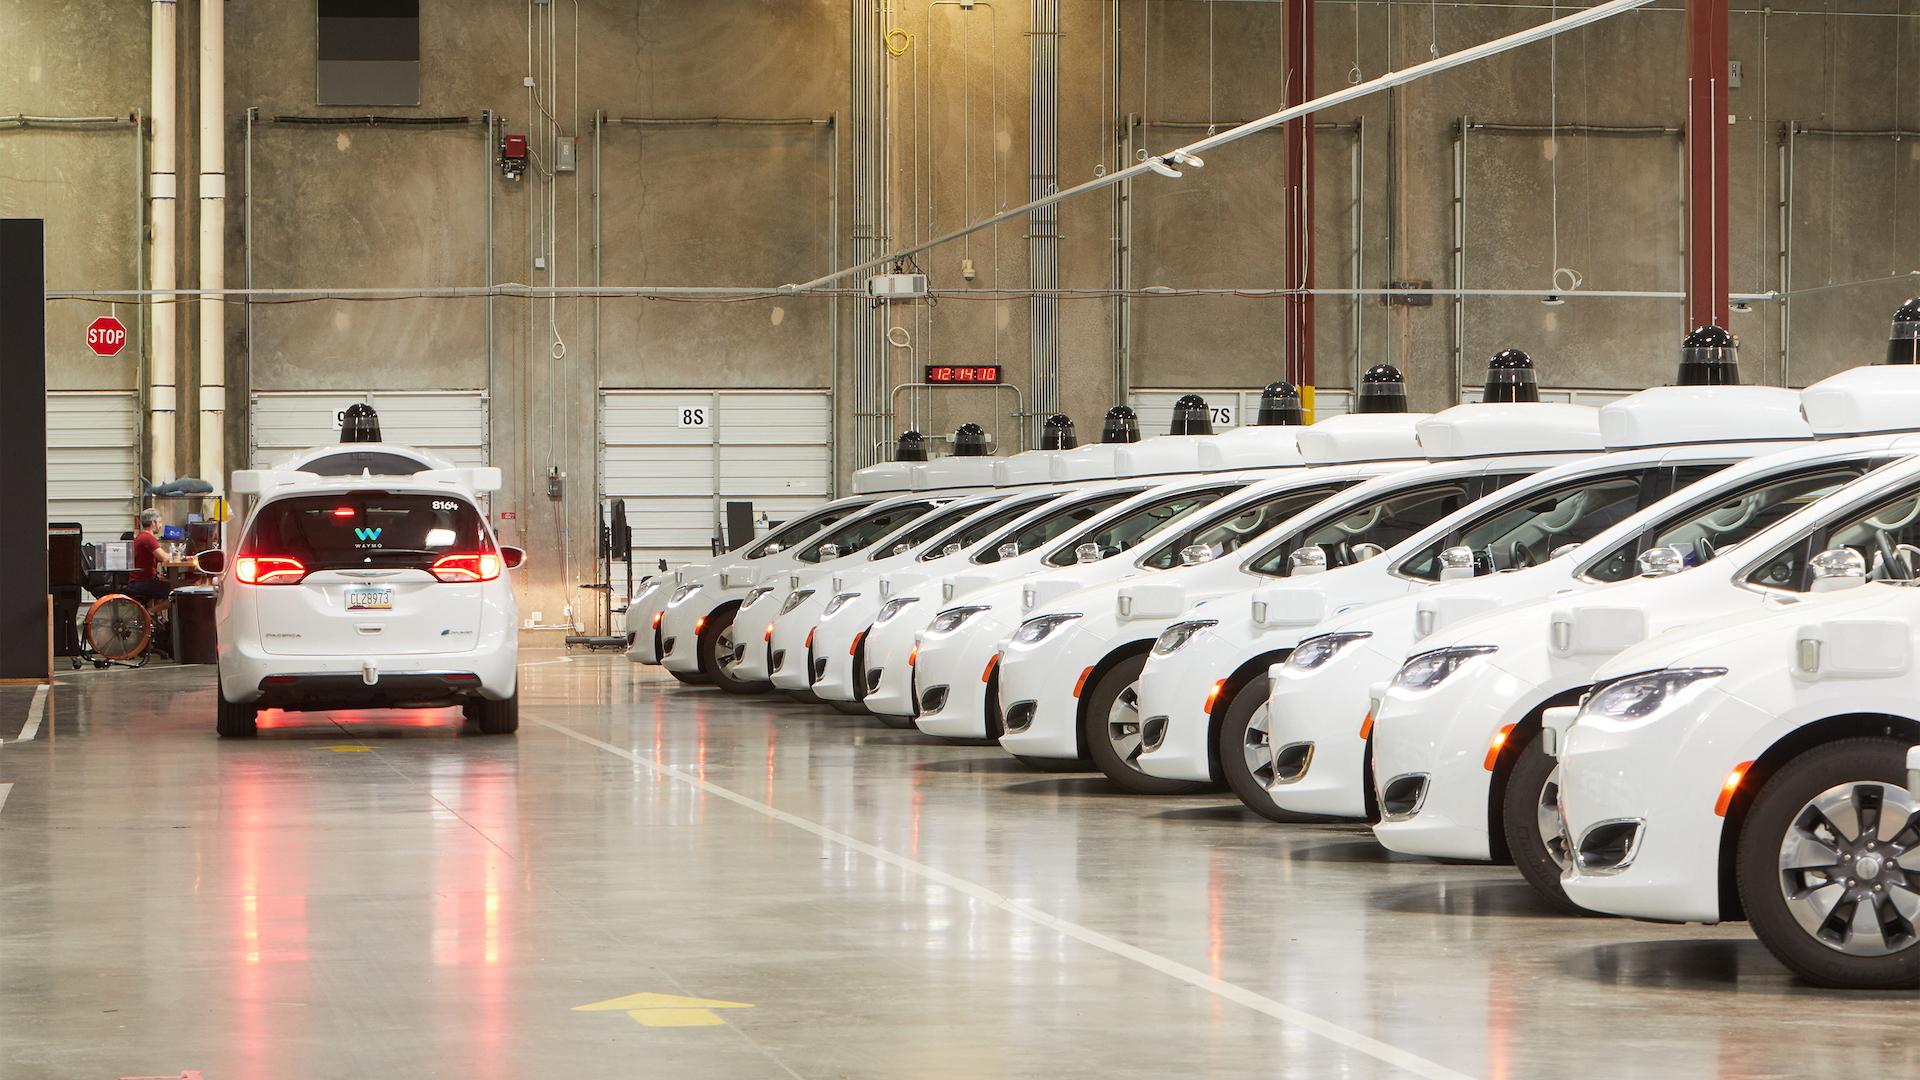 Waymo self-driving car depot in Chandler, Arizona